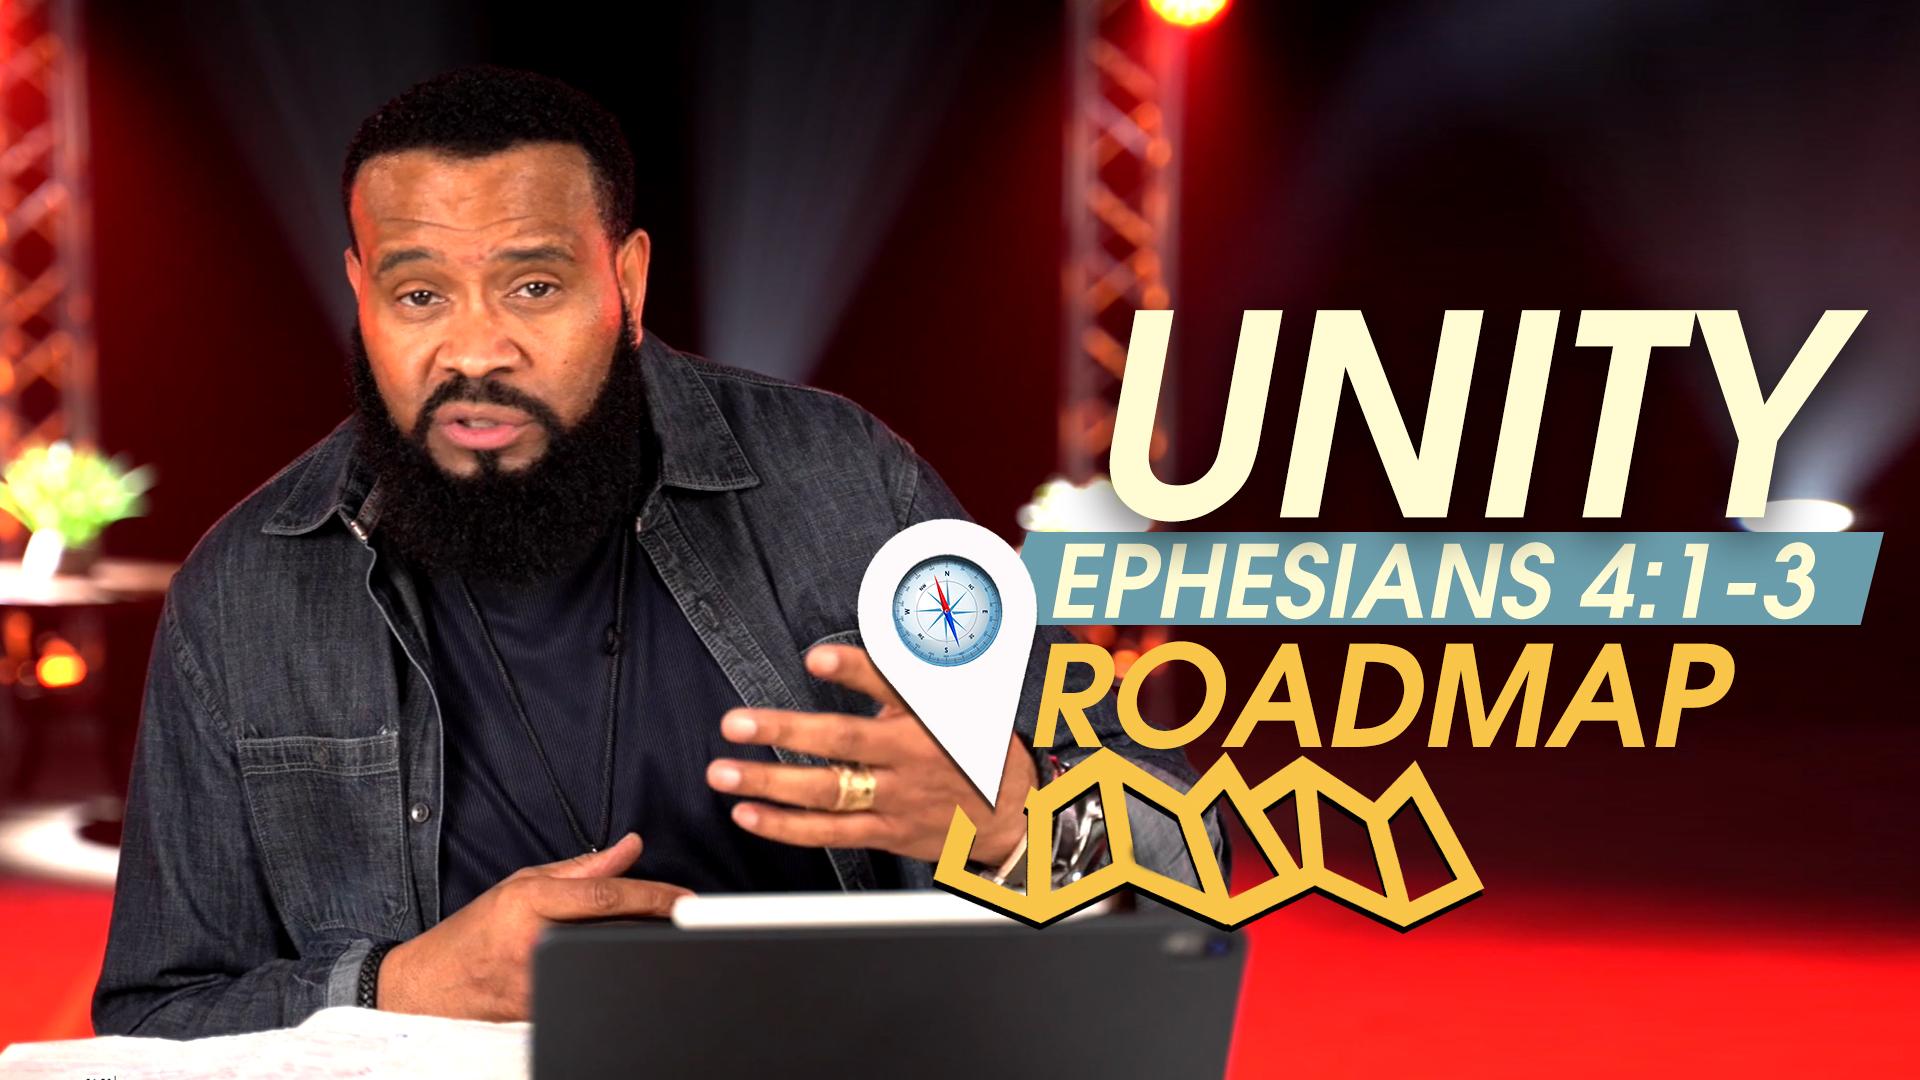 Unity Roadmap – Ephesians 4:1-3